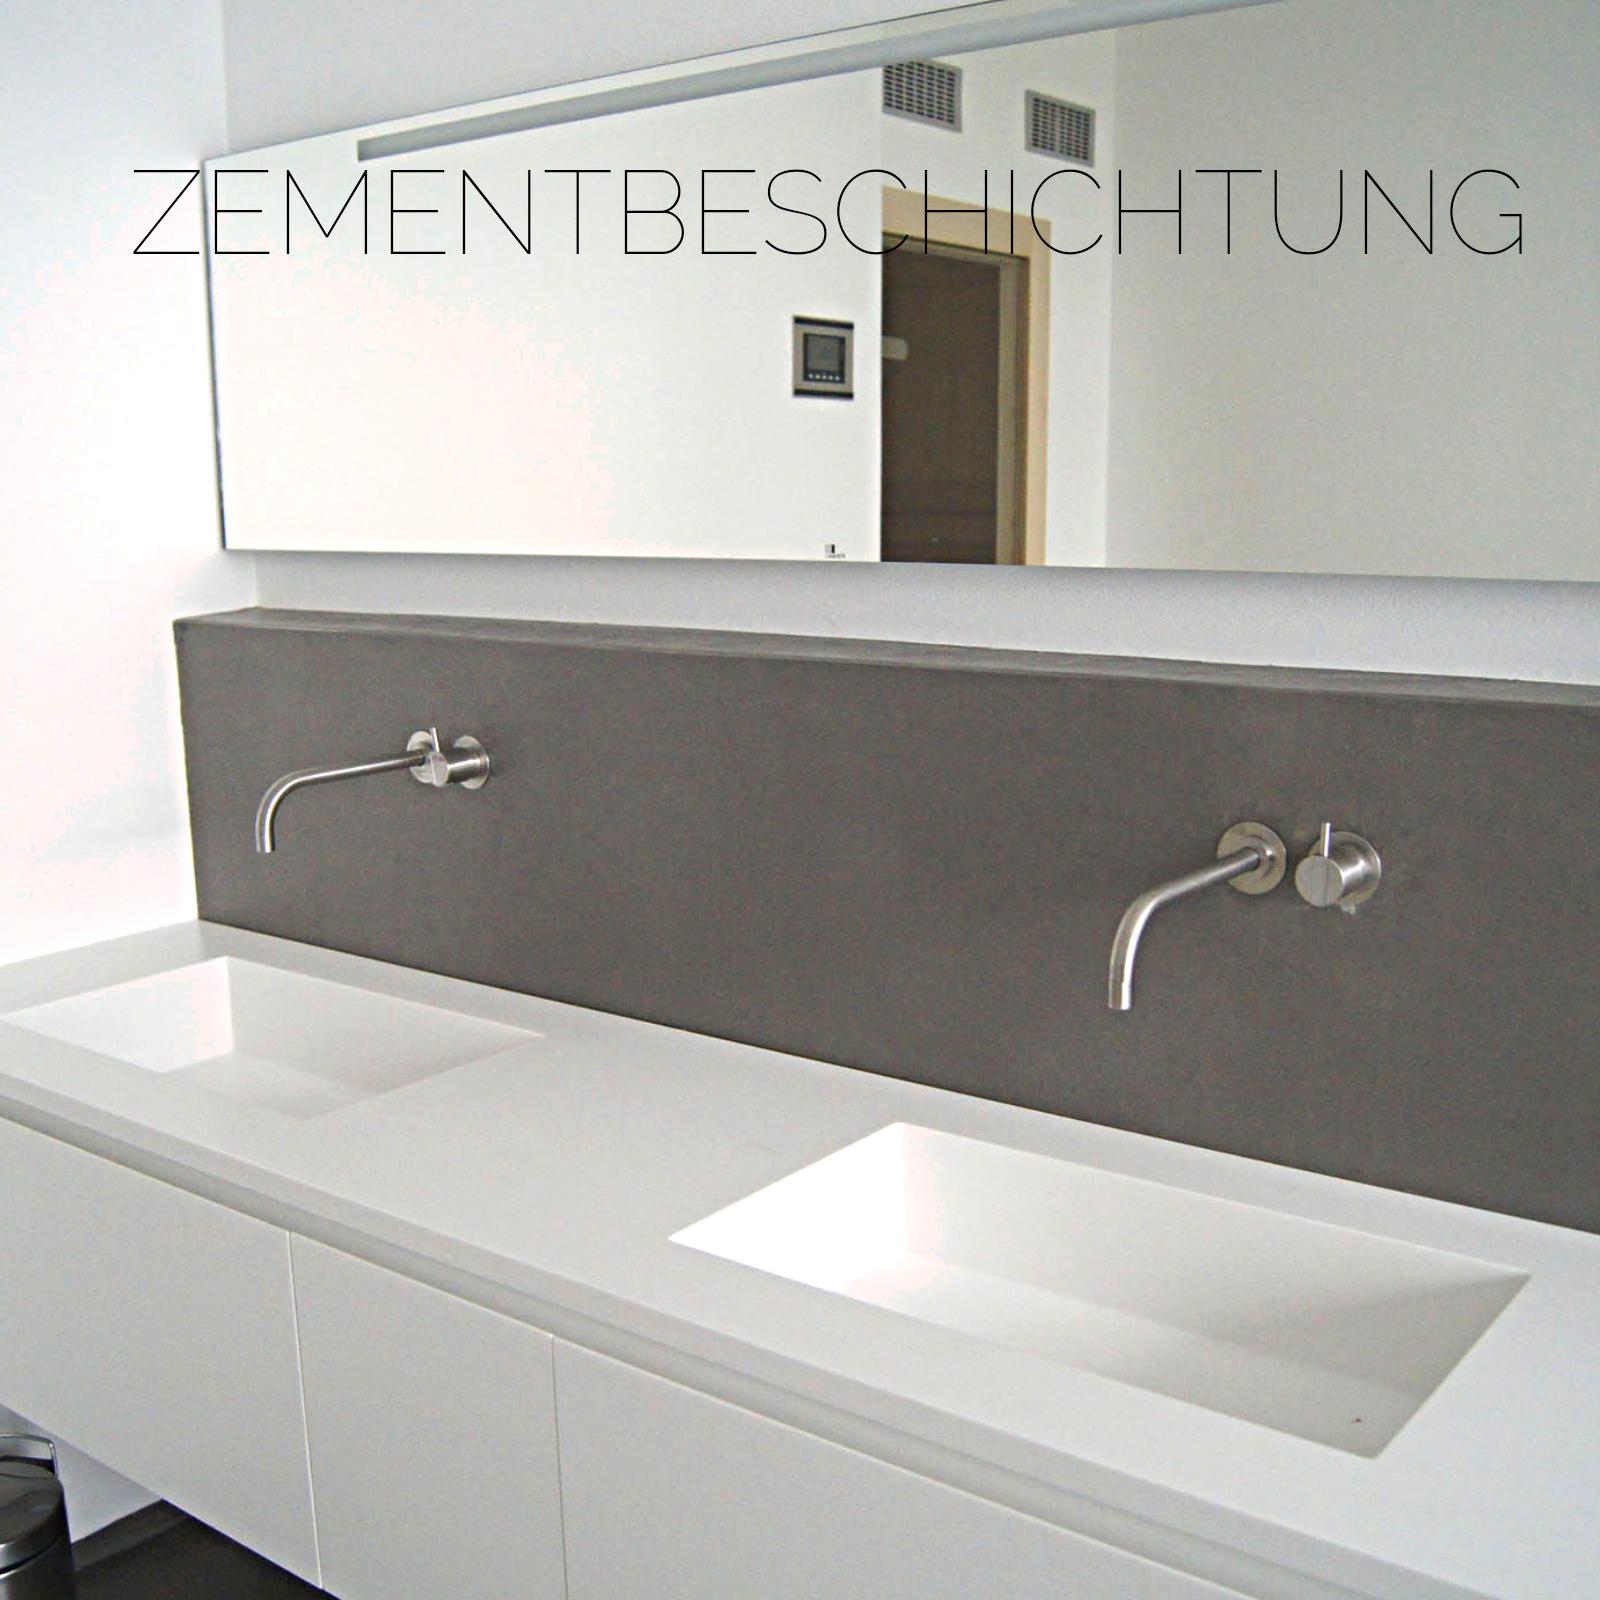 Zementbeschichtung über dem Waschbecken wasserfest